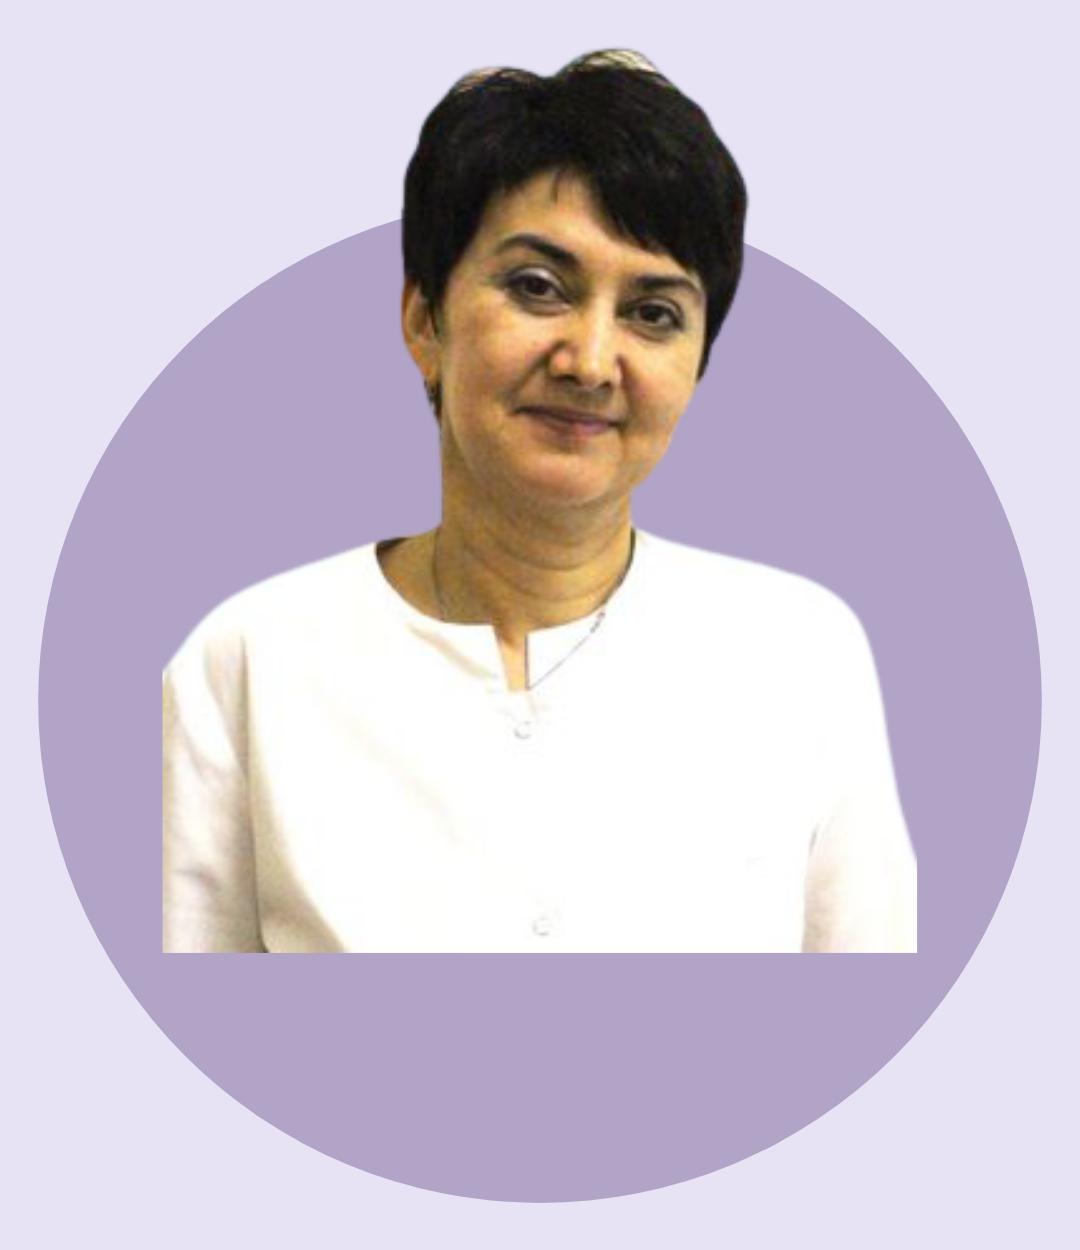 Ахметкалиева Ульяна Андреевна